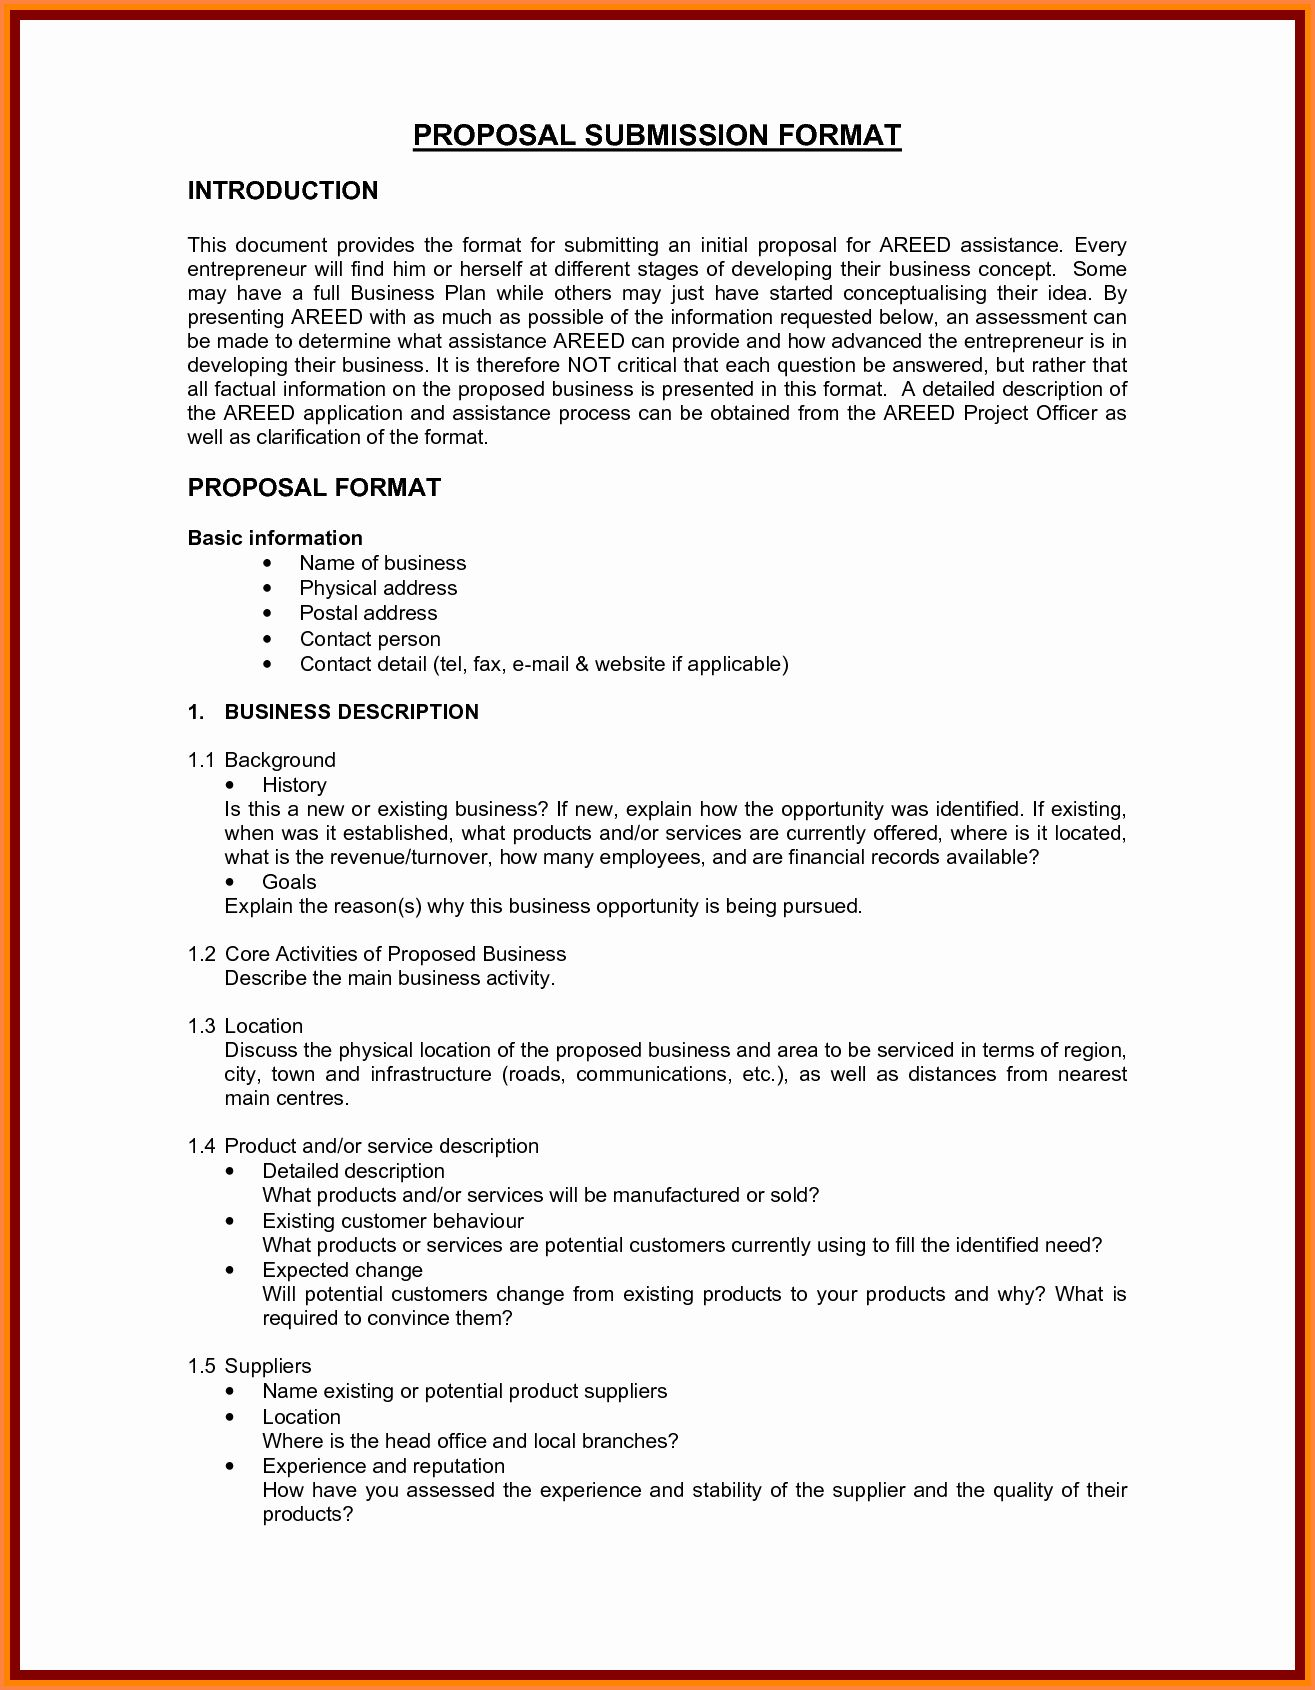 Business Partnership Proposal Sample Lovely 5 Business Proposal Format Template Business Proposal Business Proposal Format Business Proposal Sample